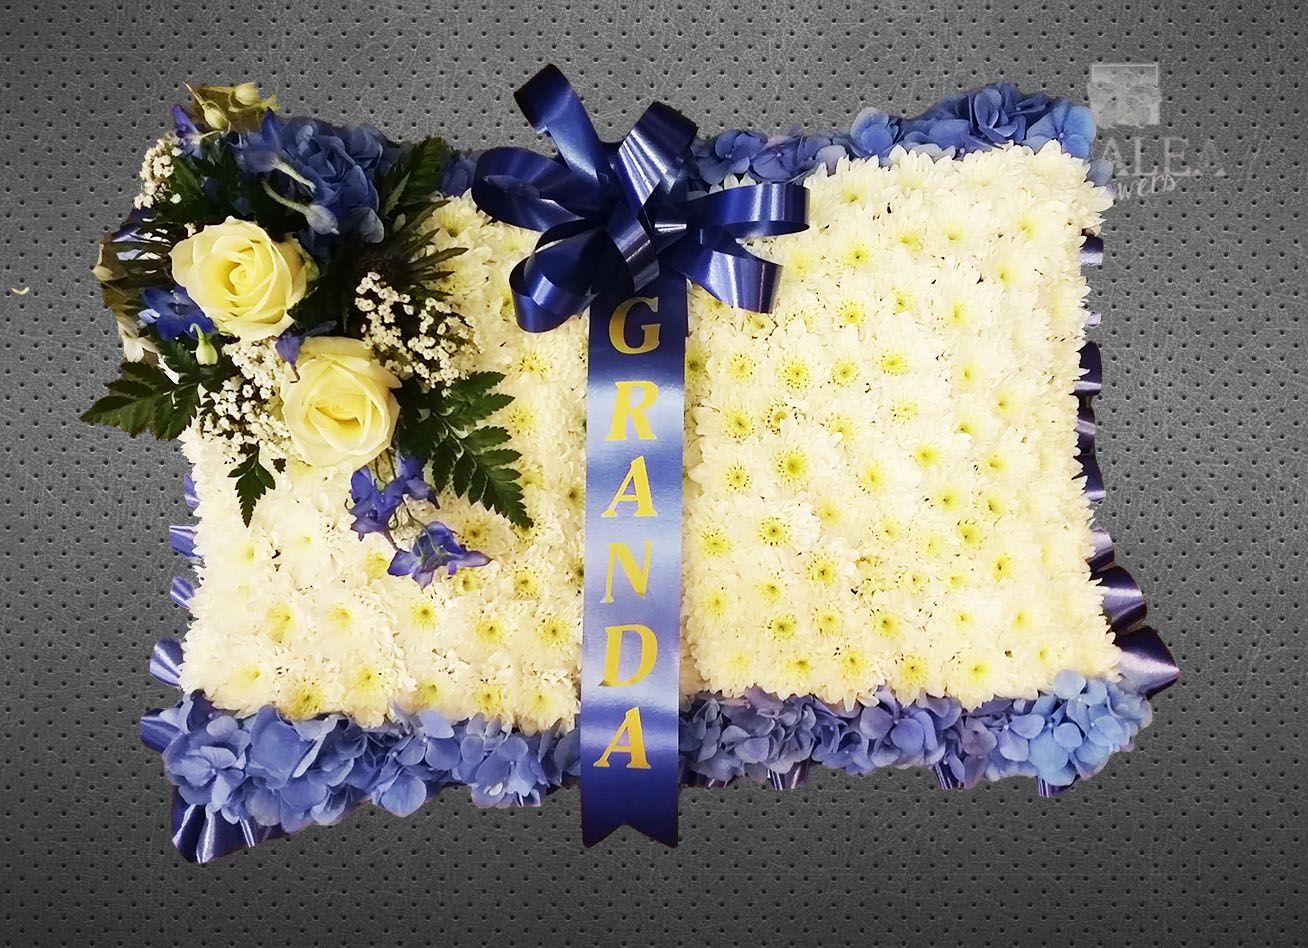 Funeral Pillow Azaleaflowers Sympaty Funeral Flowers